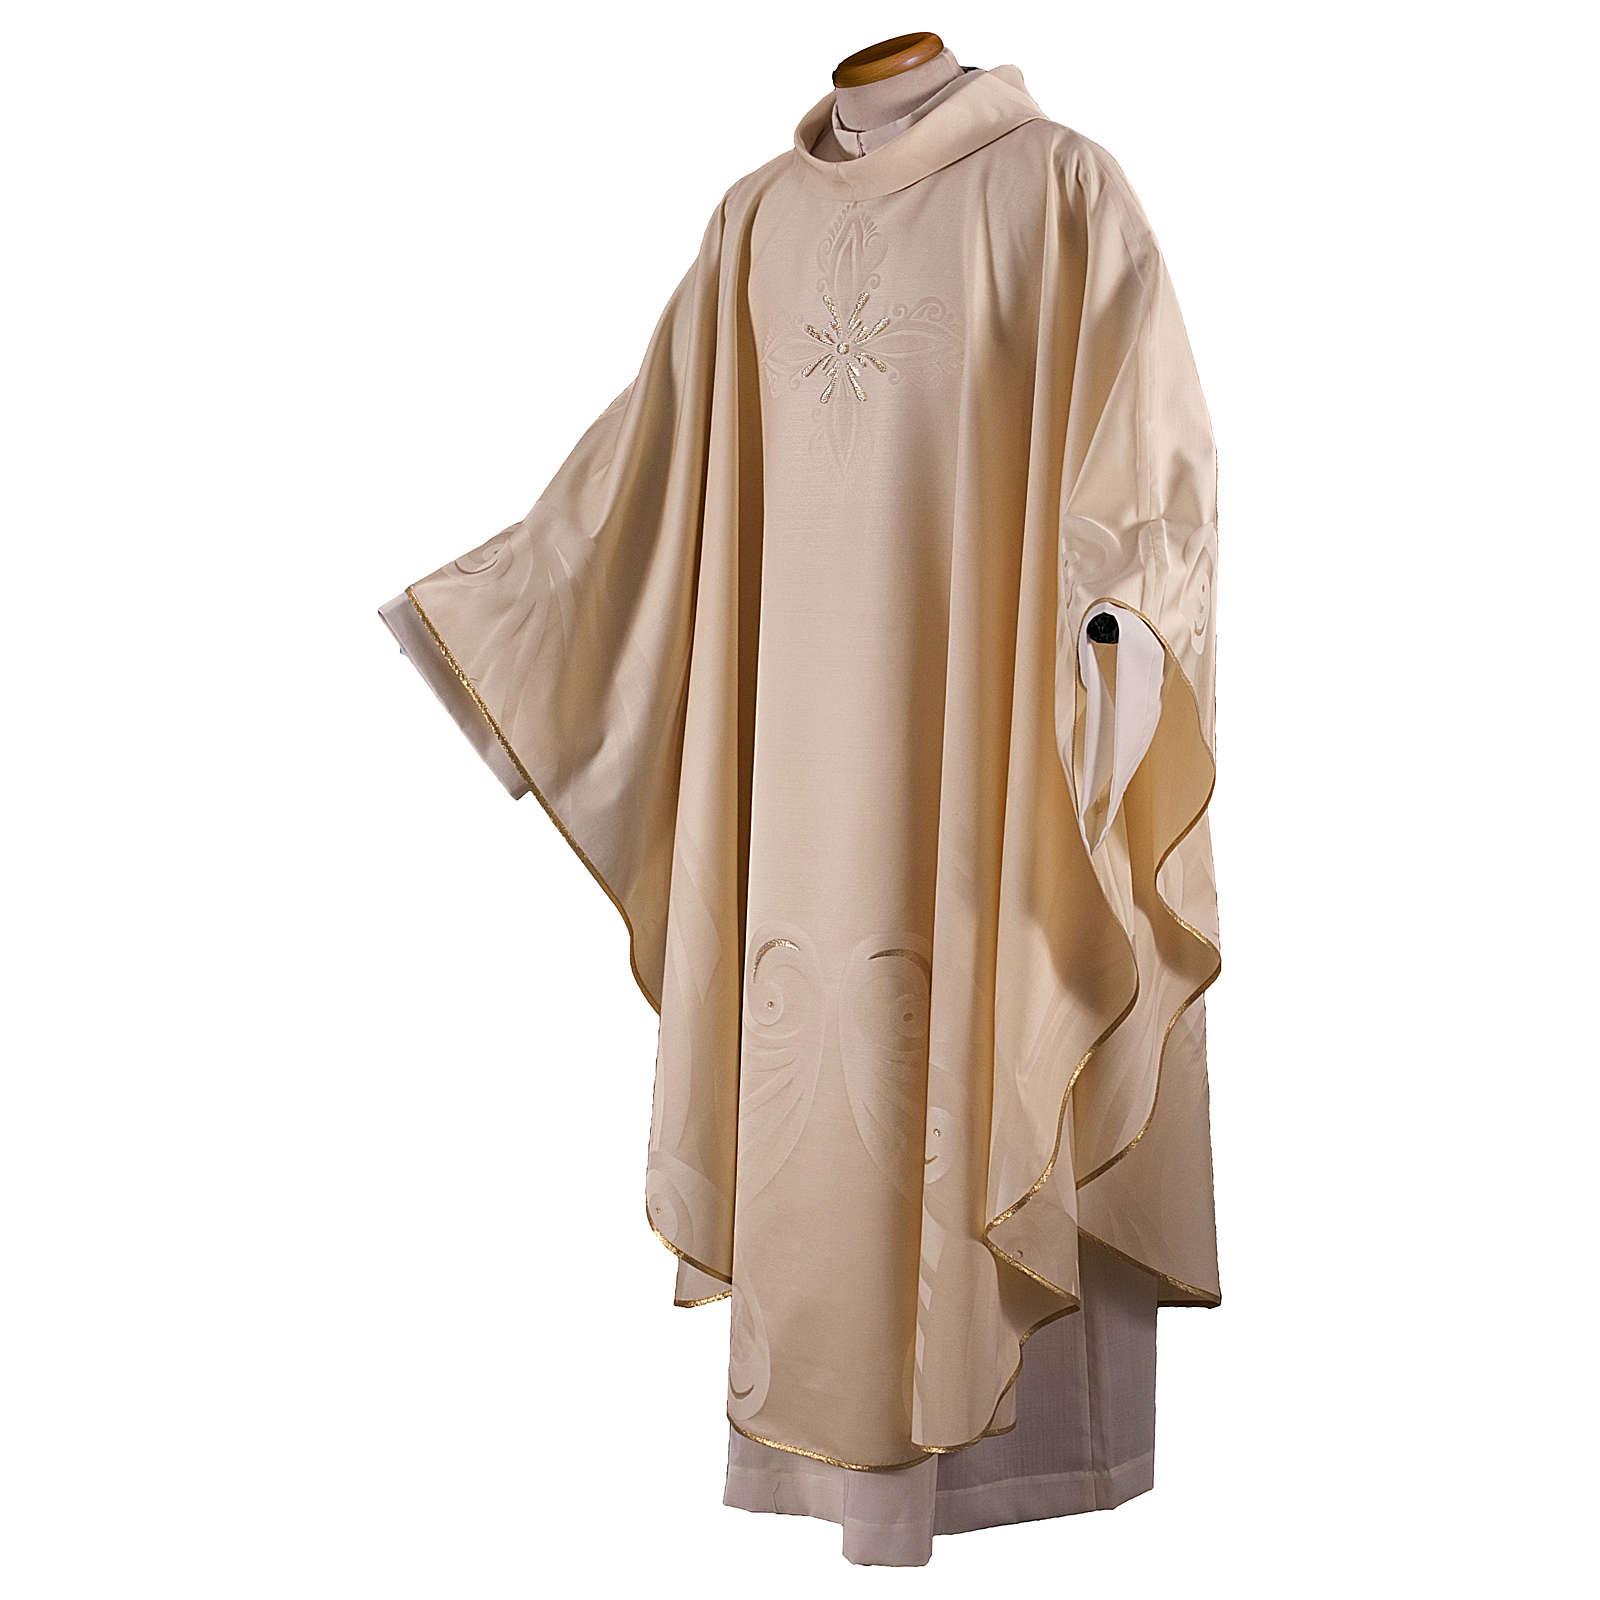 Casula in lana seta lavorata su telai Jacquard 4